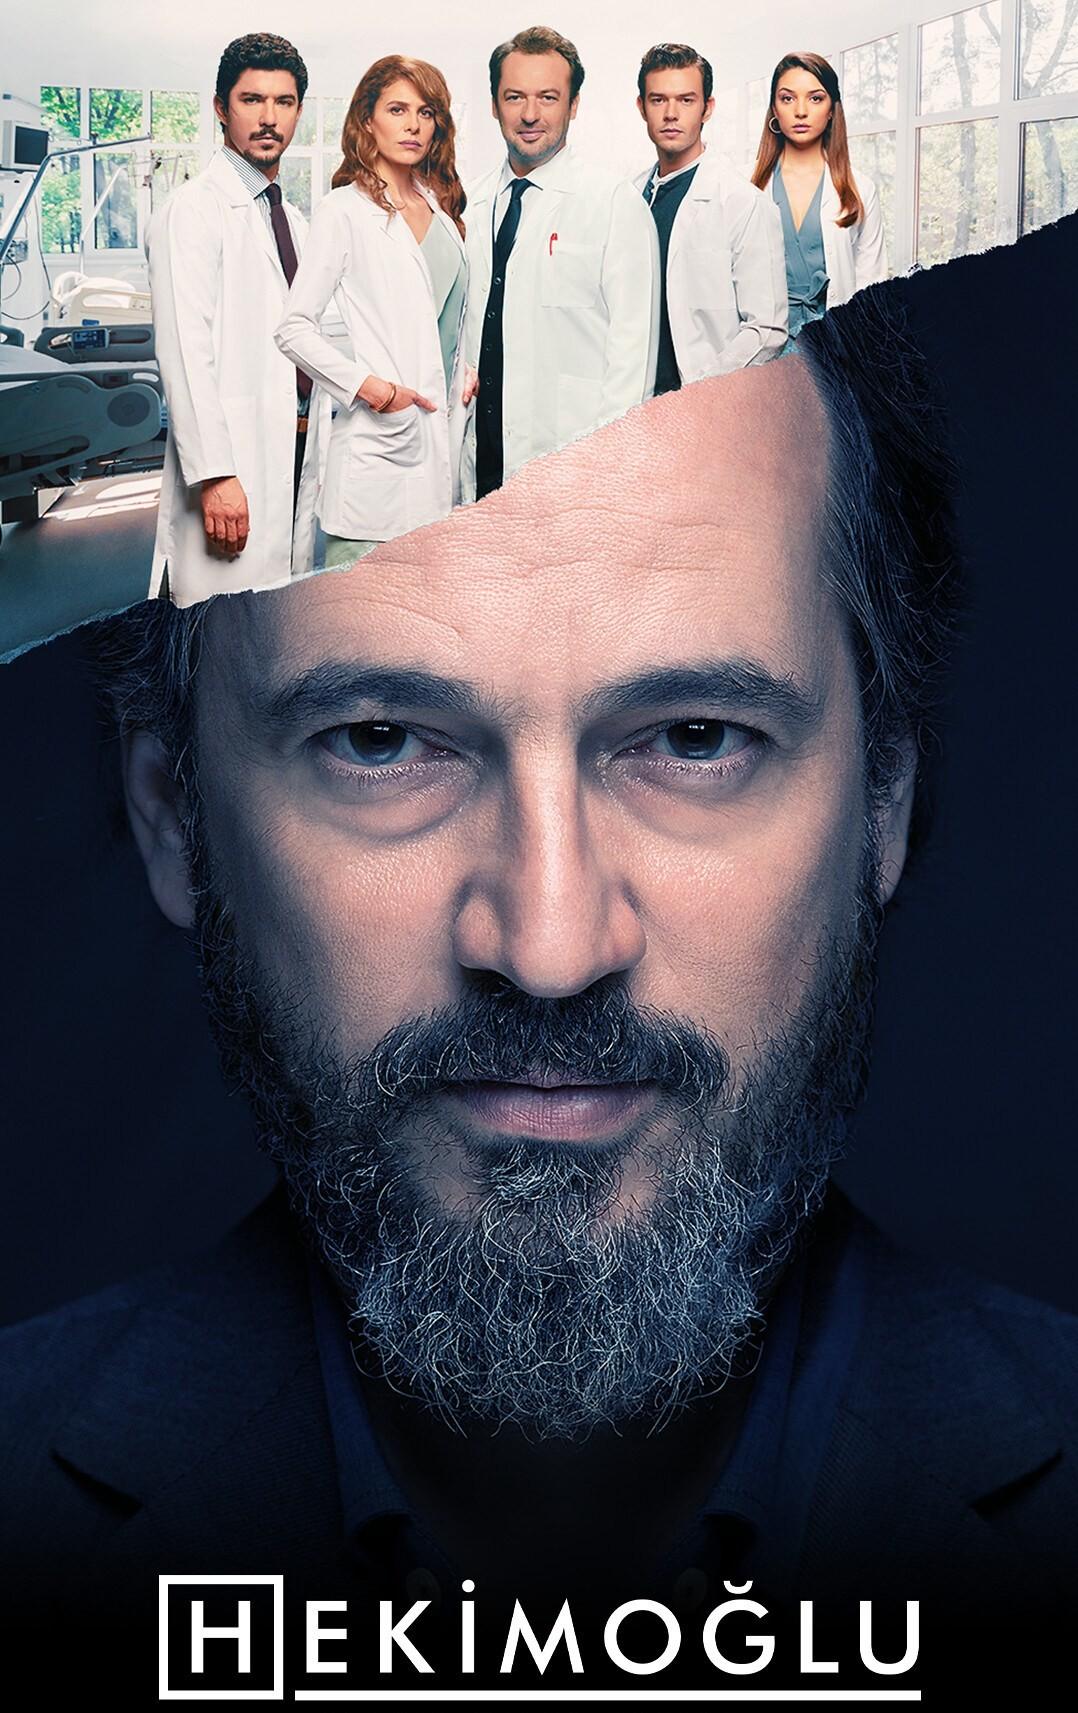 Hekimoğlu 40.Blm (09.03.2021) 720p WEB-DL AAC H.264